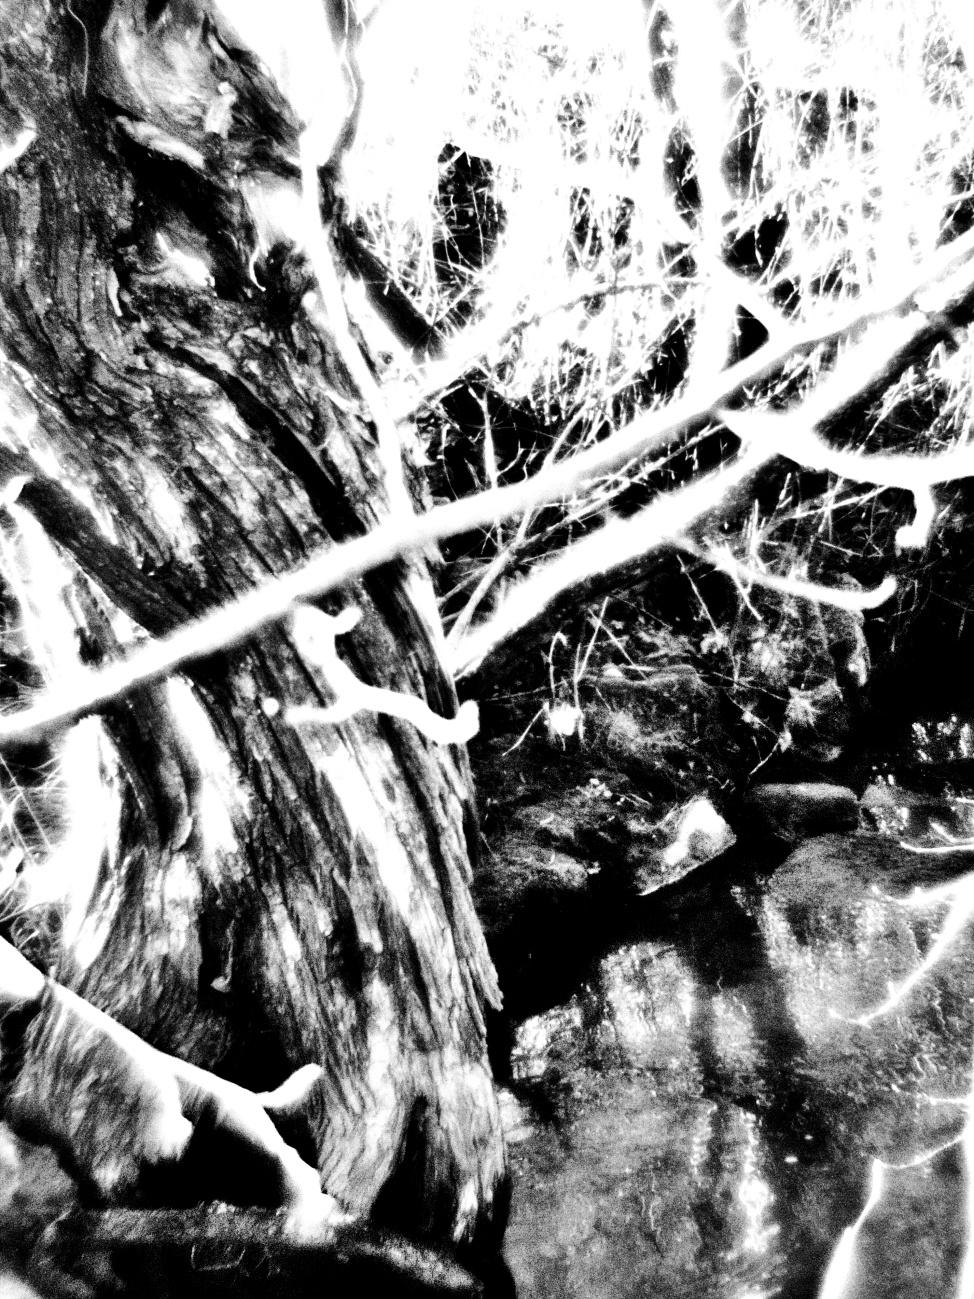 Reißender Fluß in Black Noir